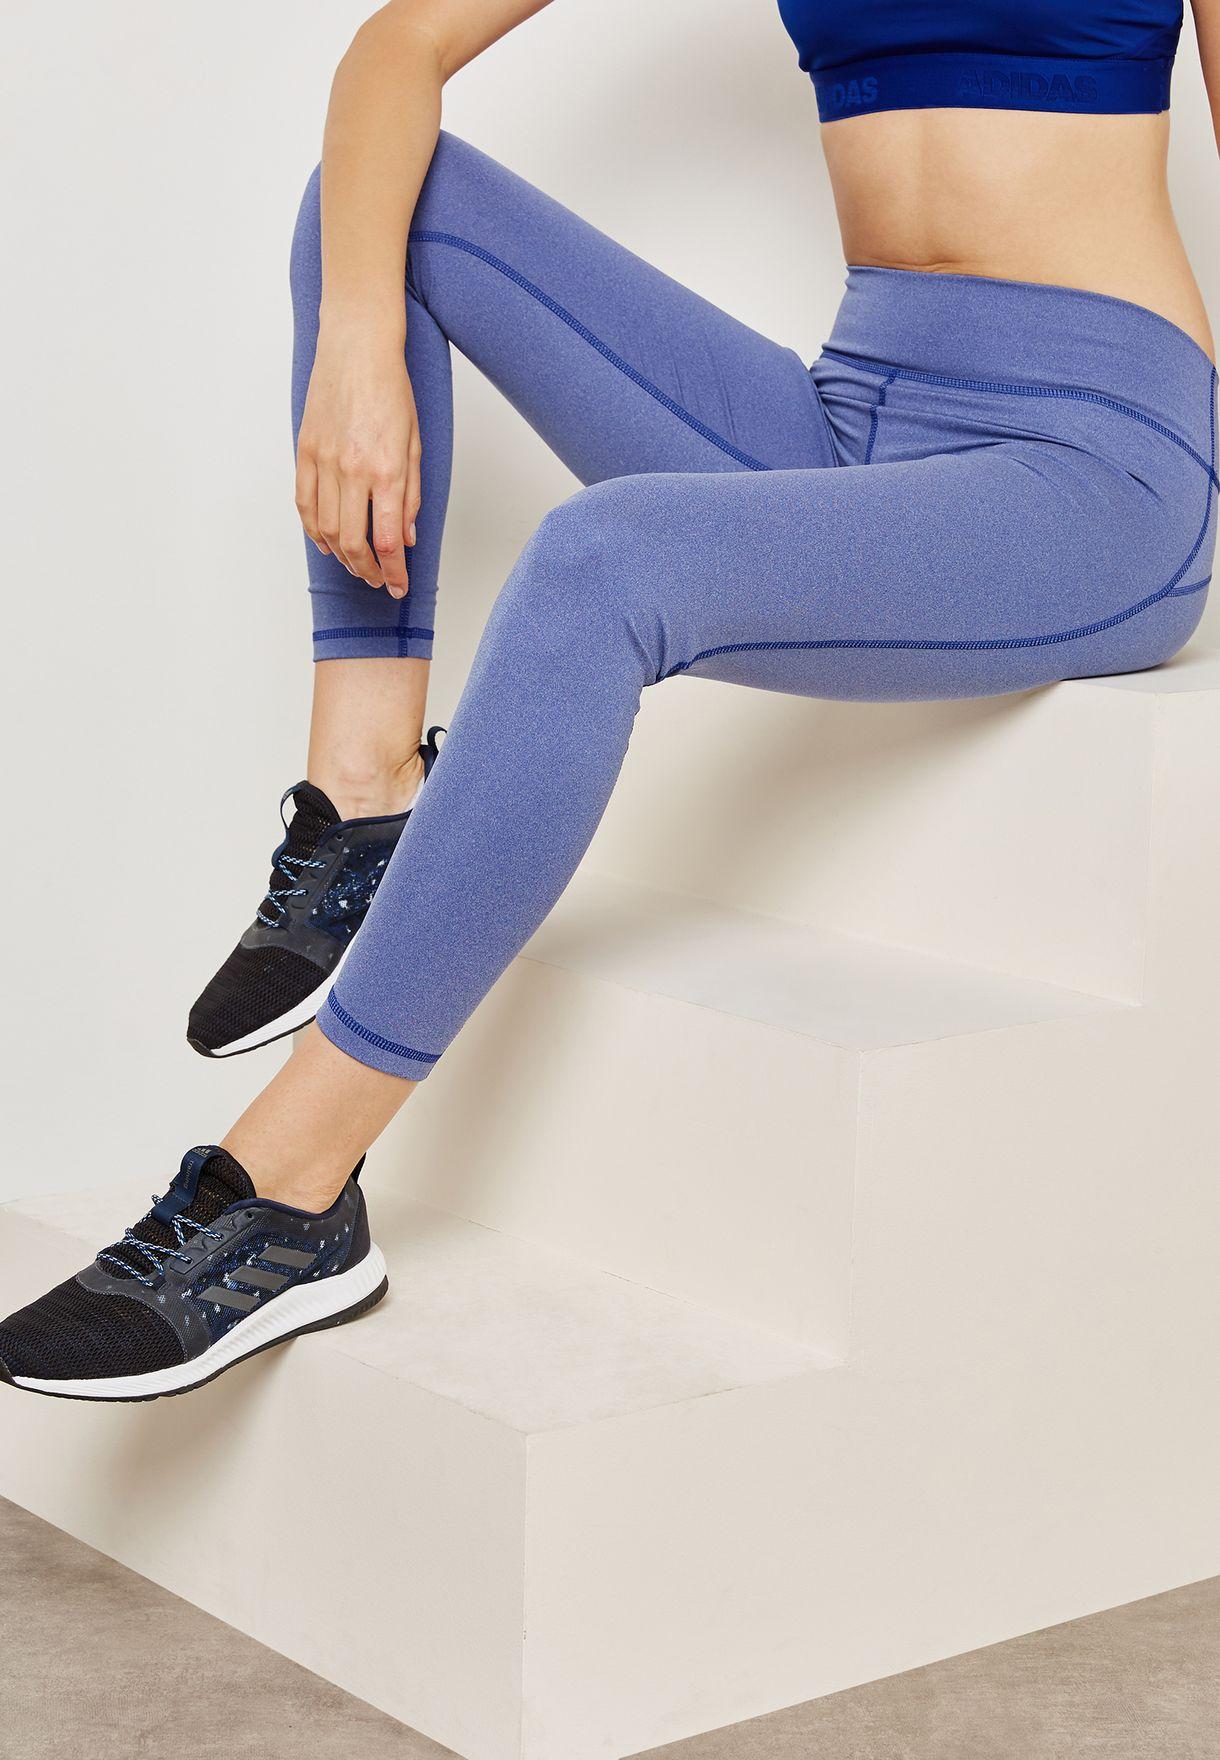 69e38c198c6 Shop adidas blue Essential 7/8 Leggings CZ7956 for Women in UAE -  AD476AT18YDH